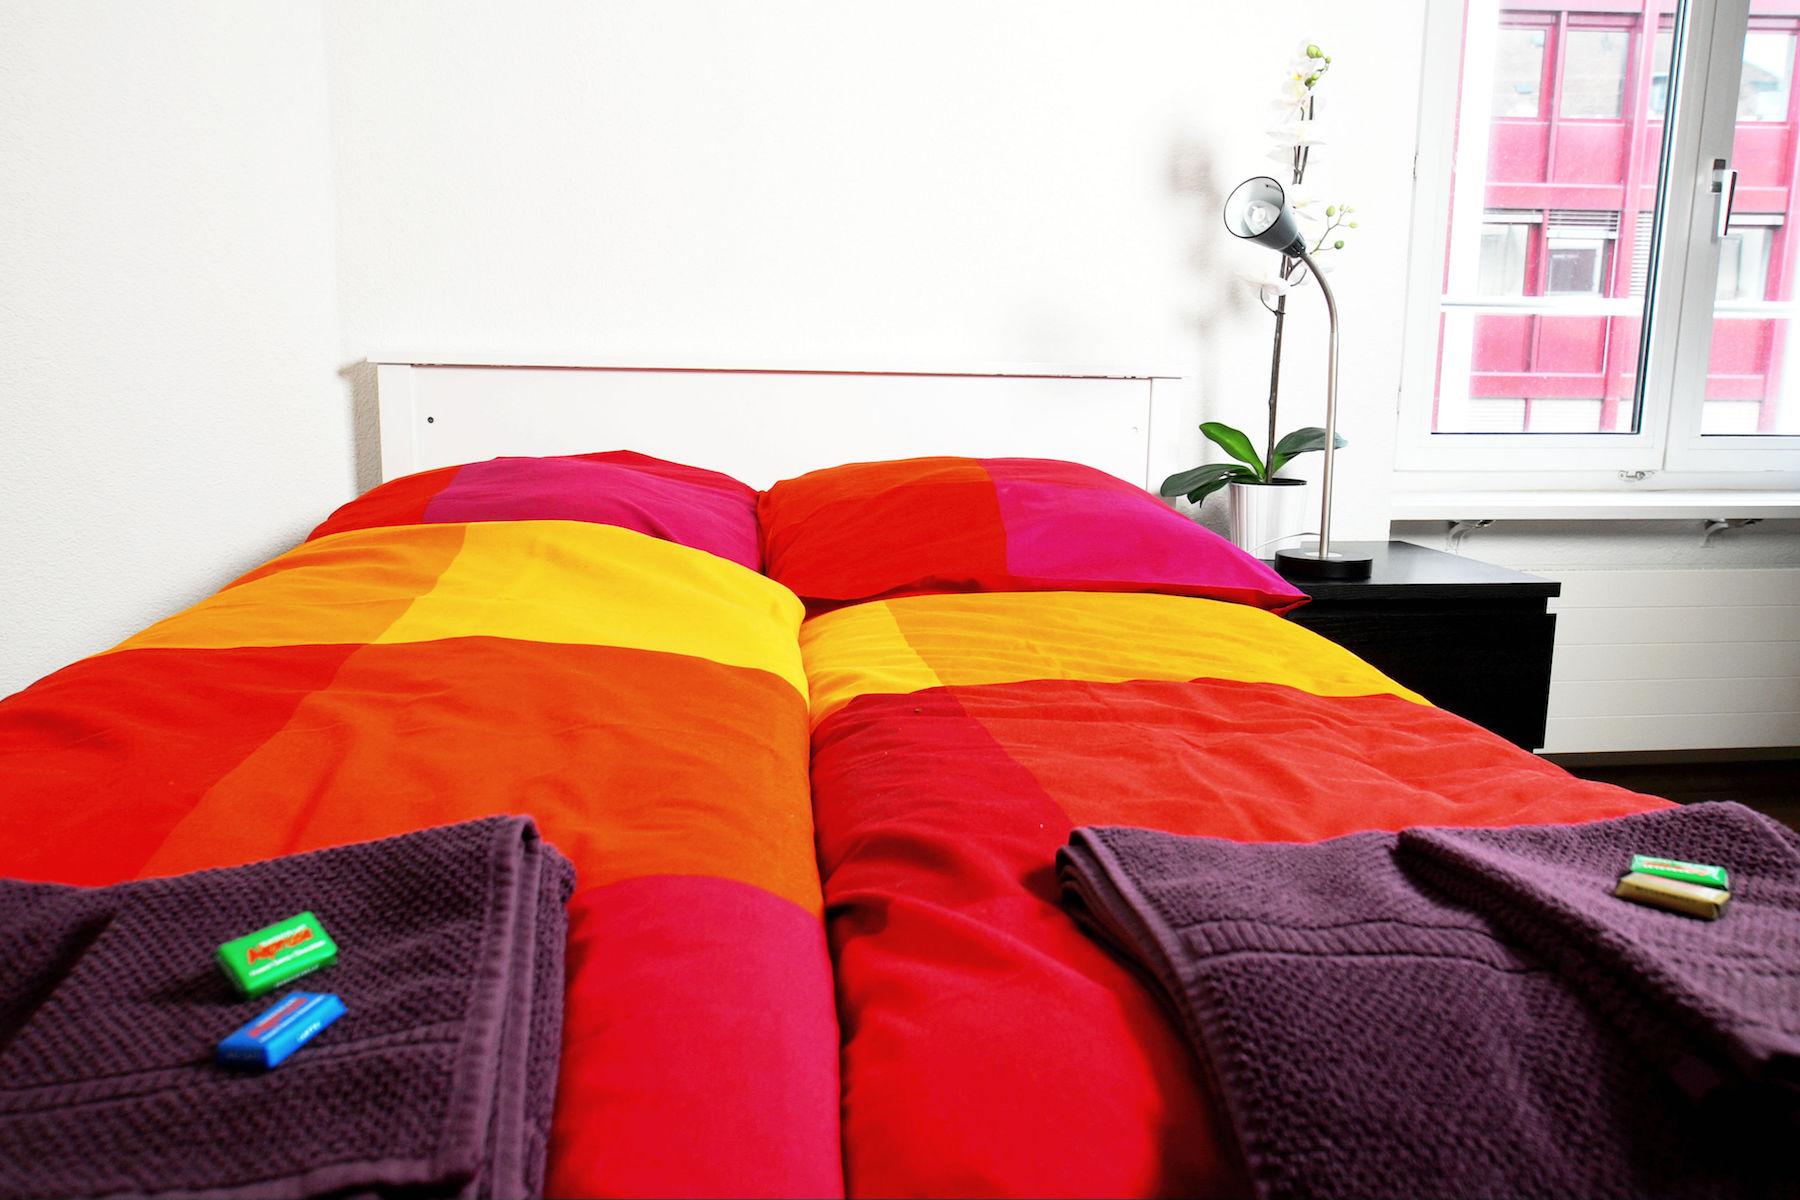 Bedding at  Oerlikon Apartments